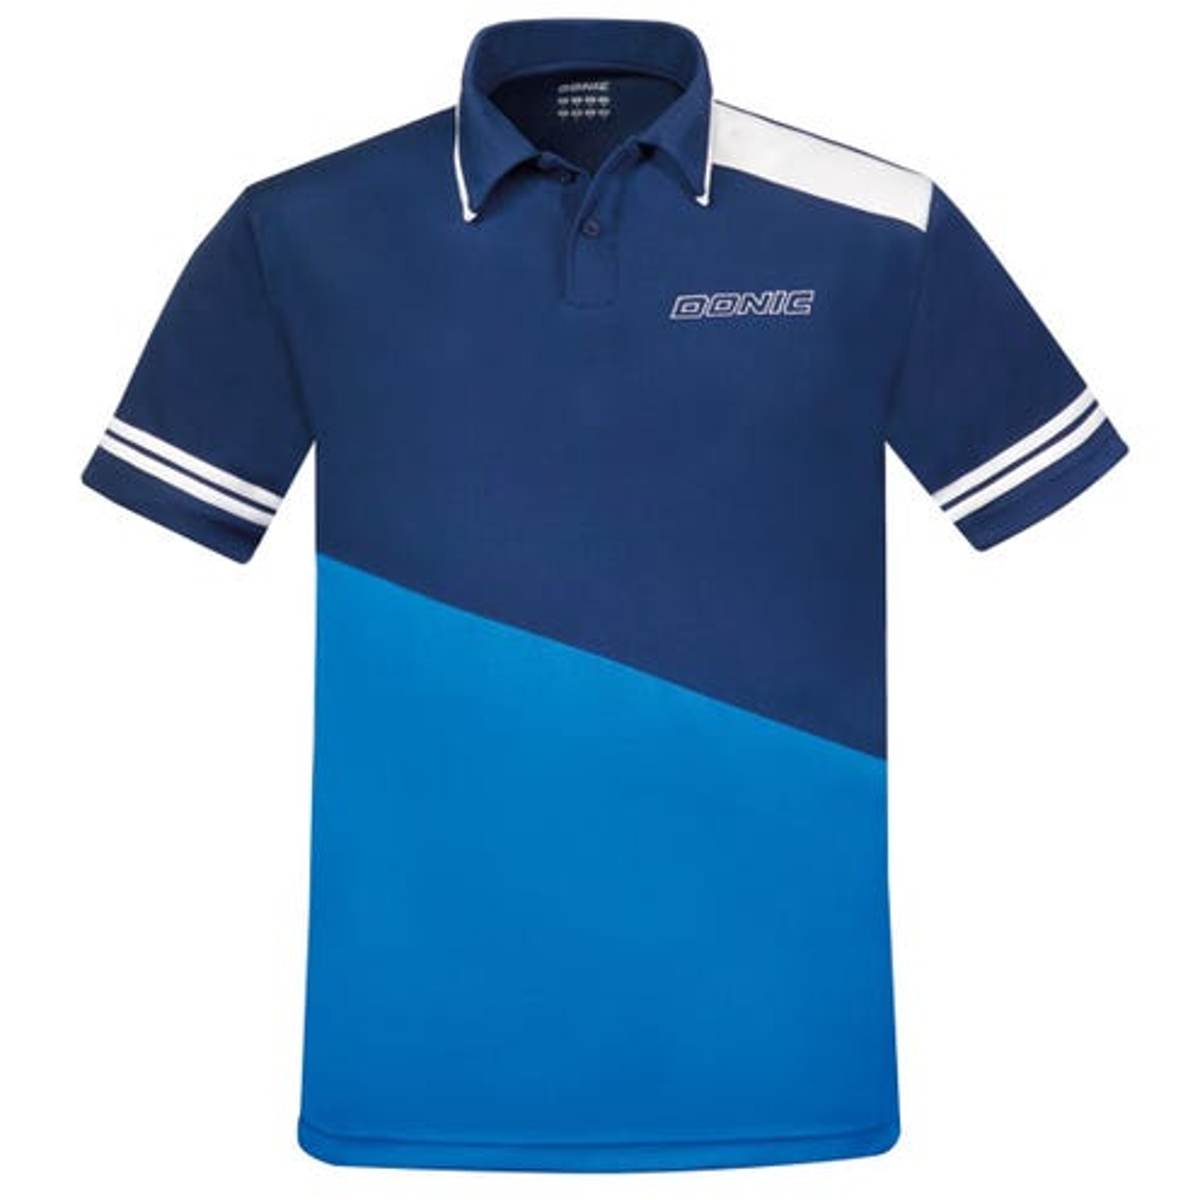 Donic Primeflex Royal Blue/Marine